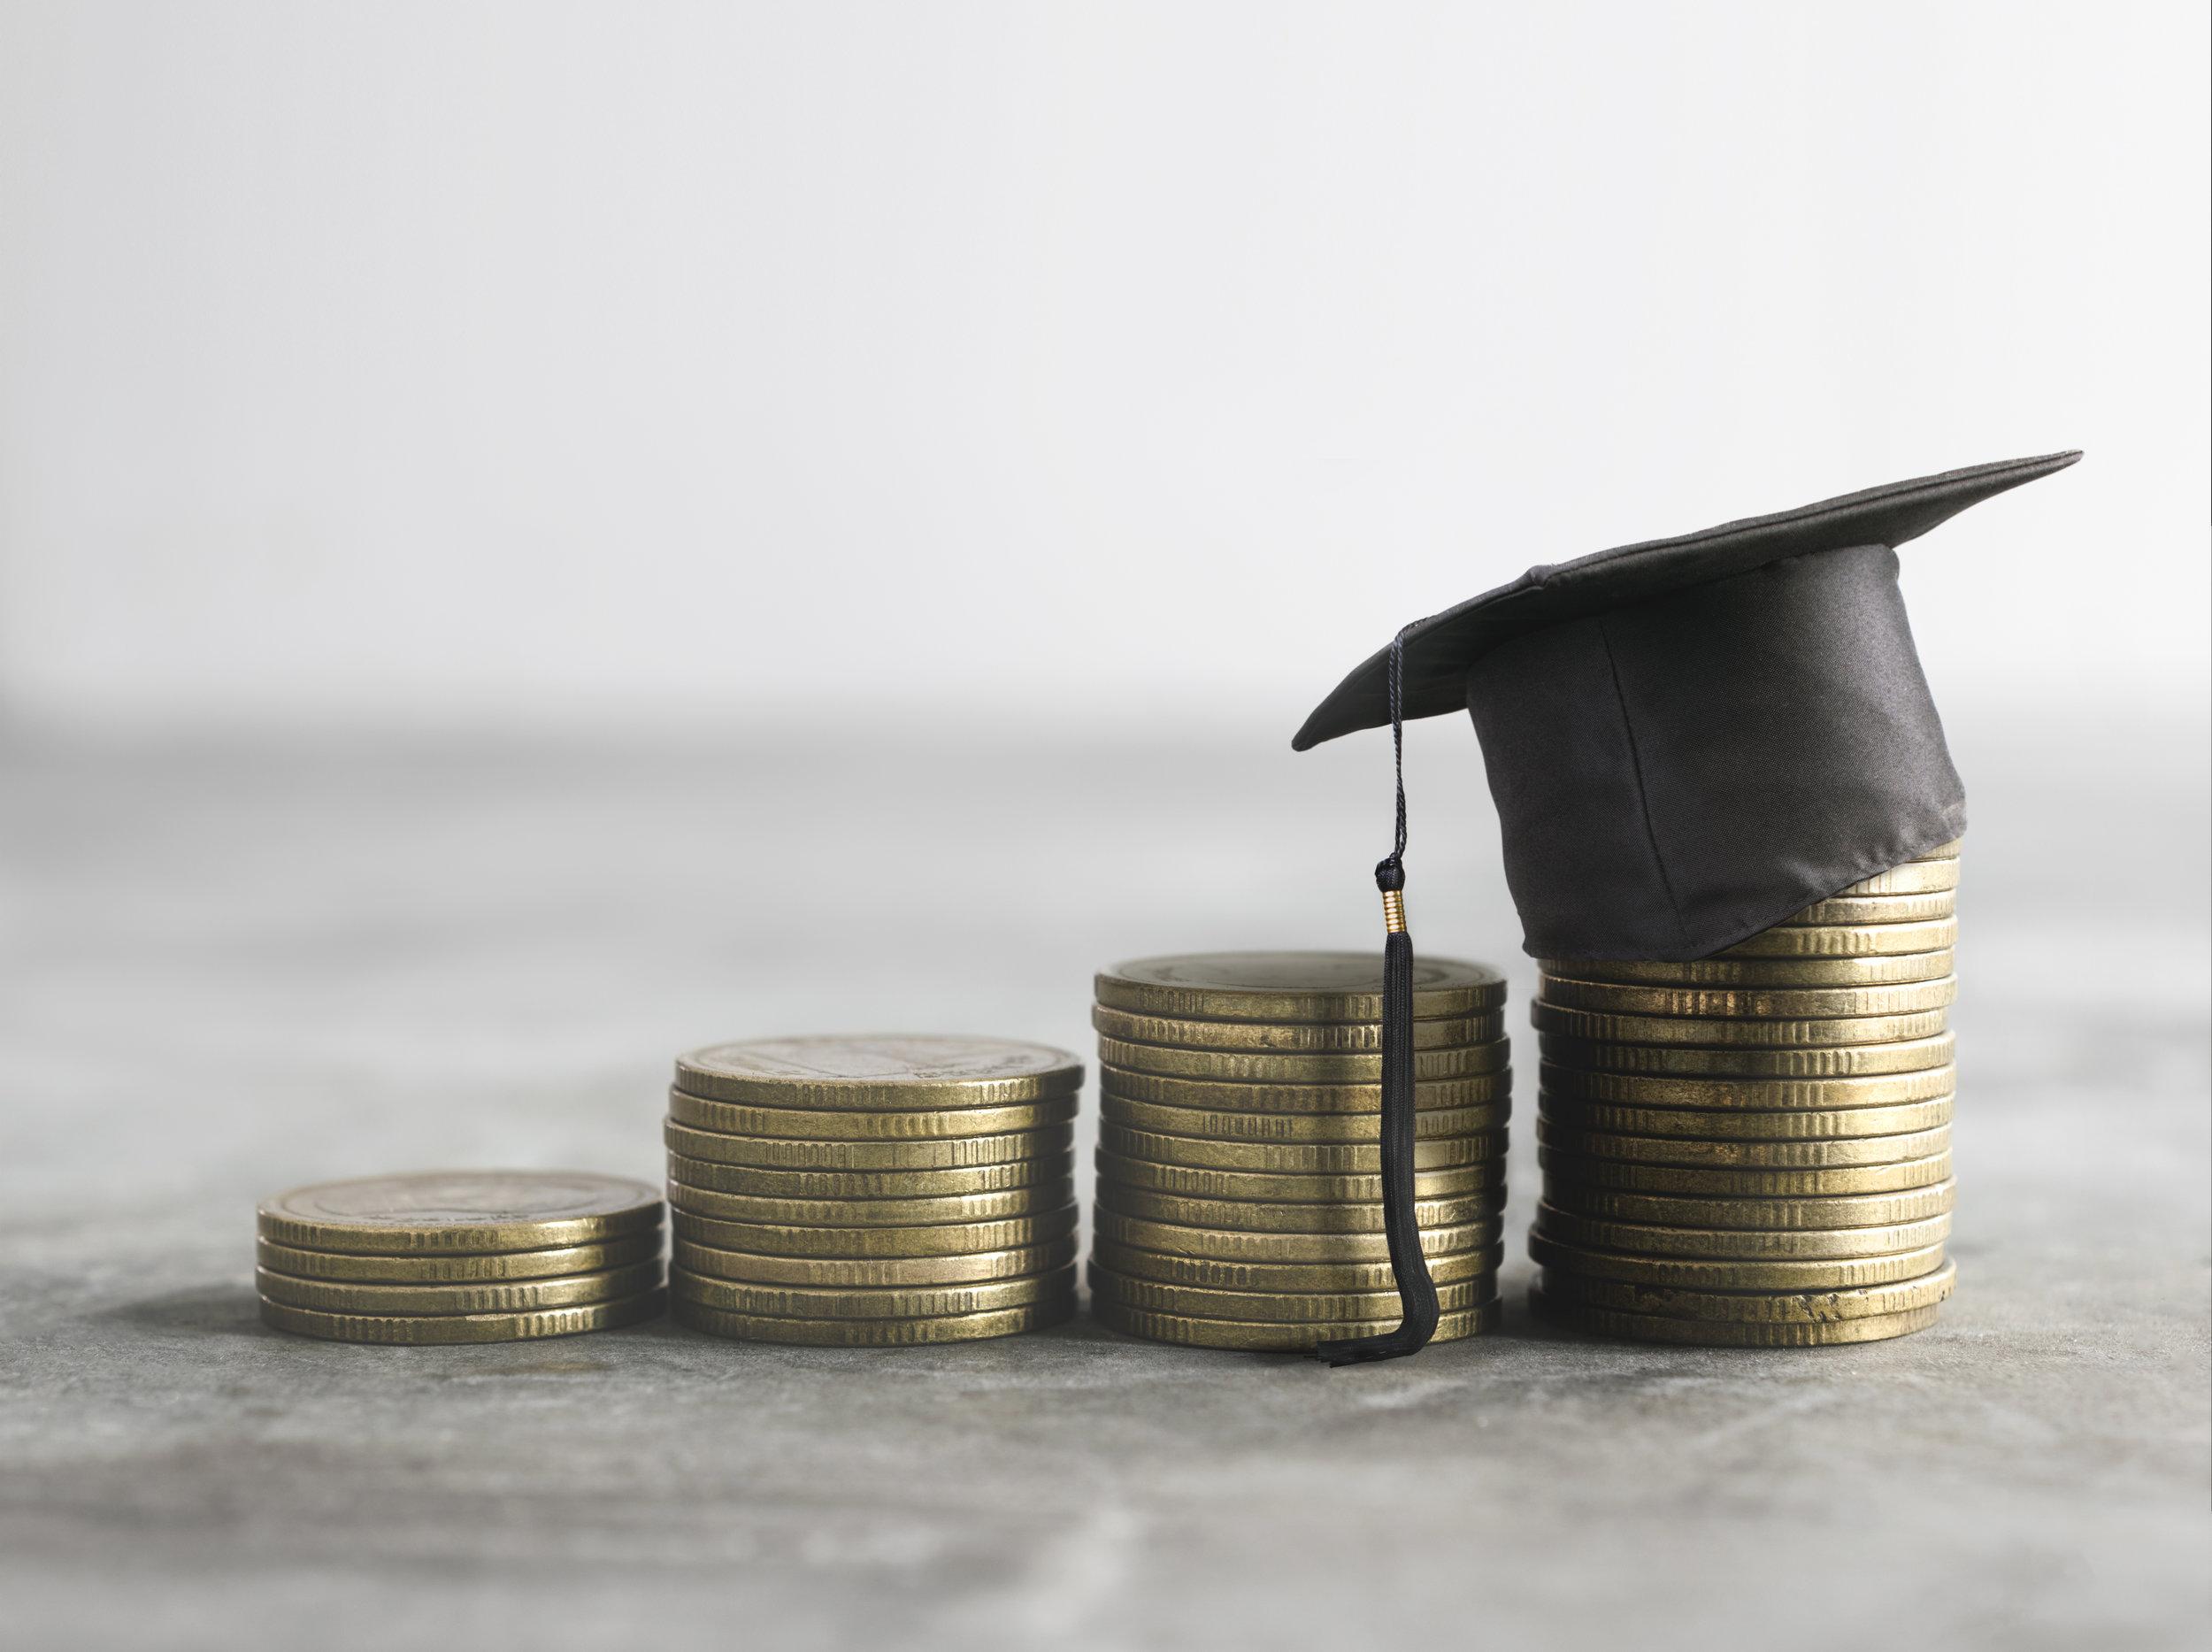 financial-education-image-2.jpeg